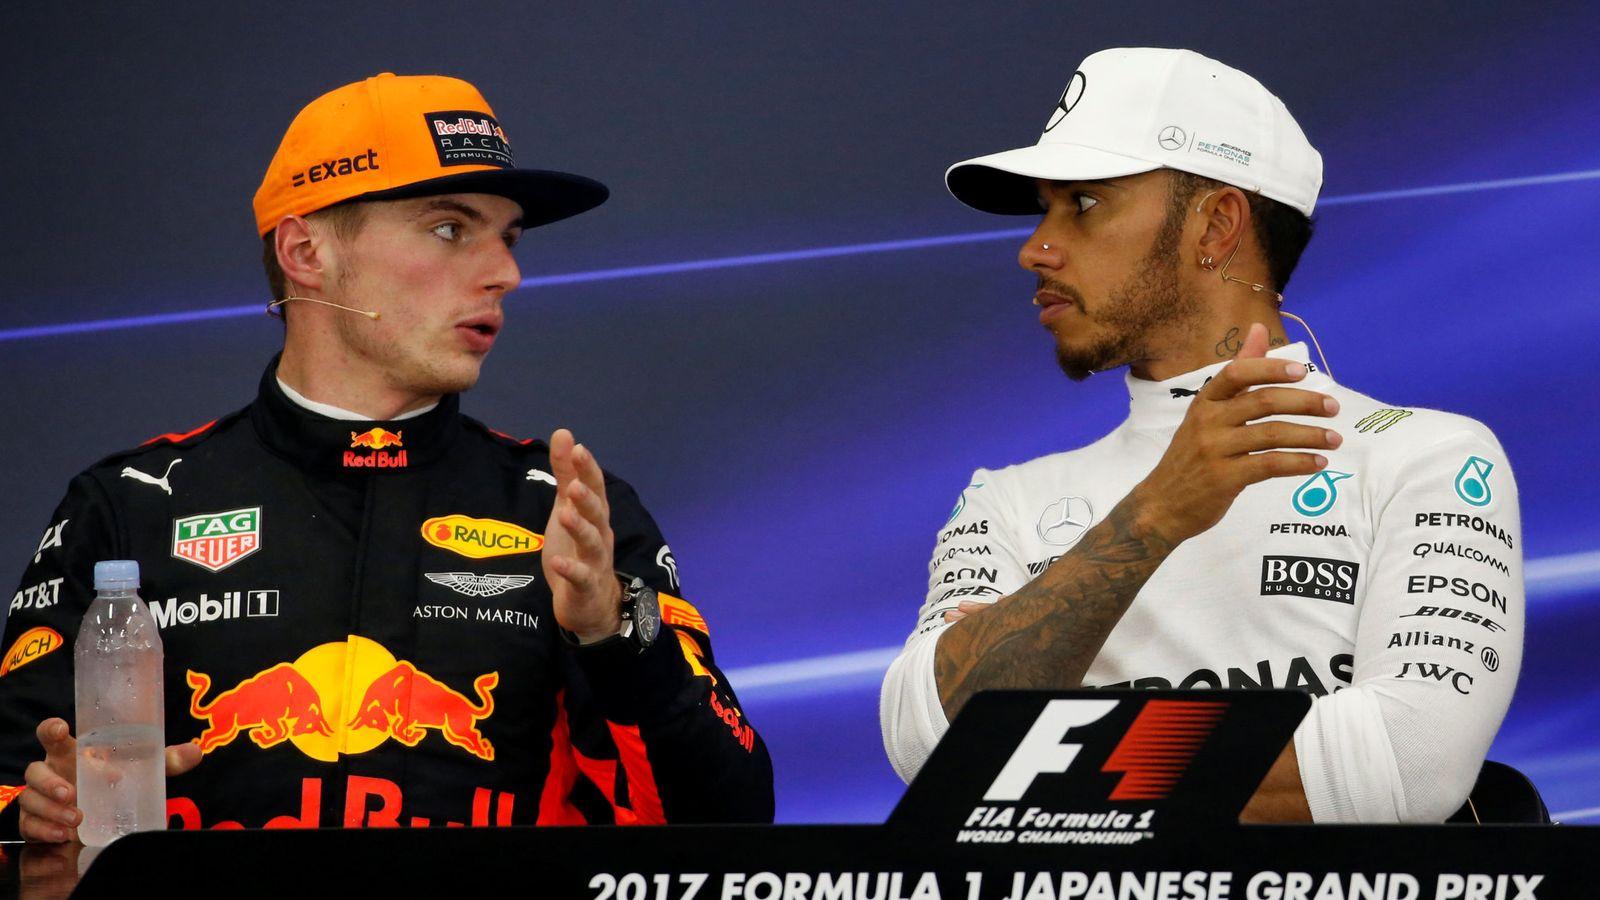 Foto: En la imagen, Lewis Hamilton charla con Max Verstappen. (Reuters)